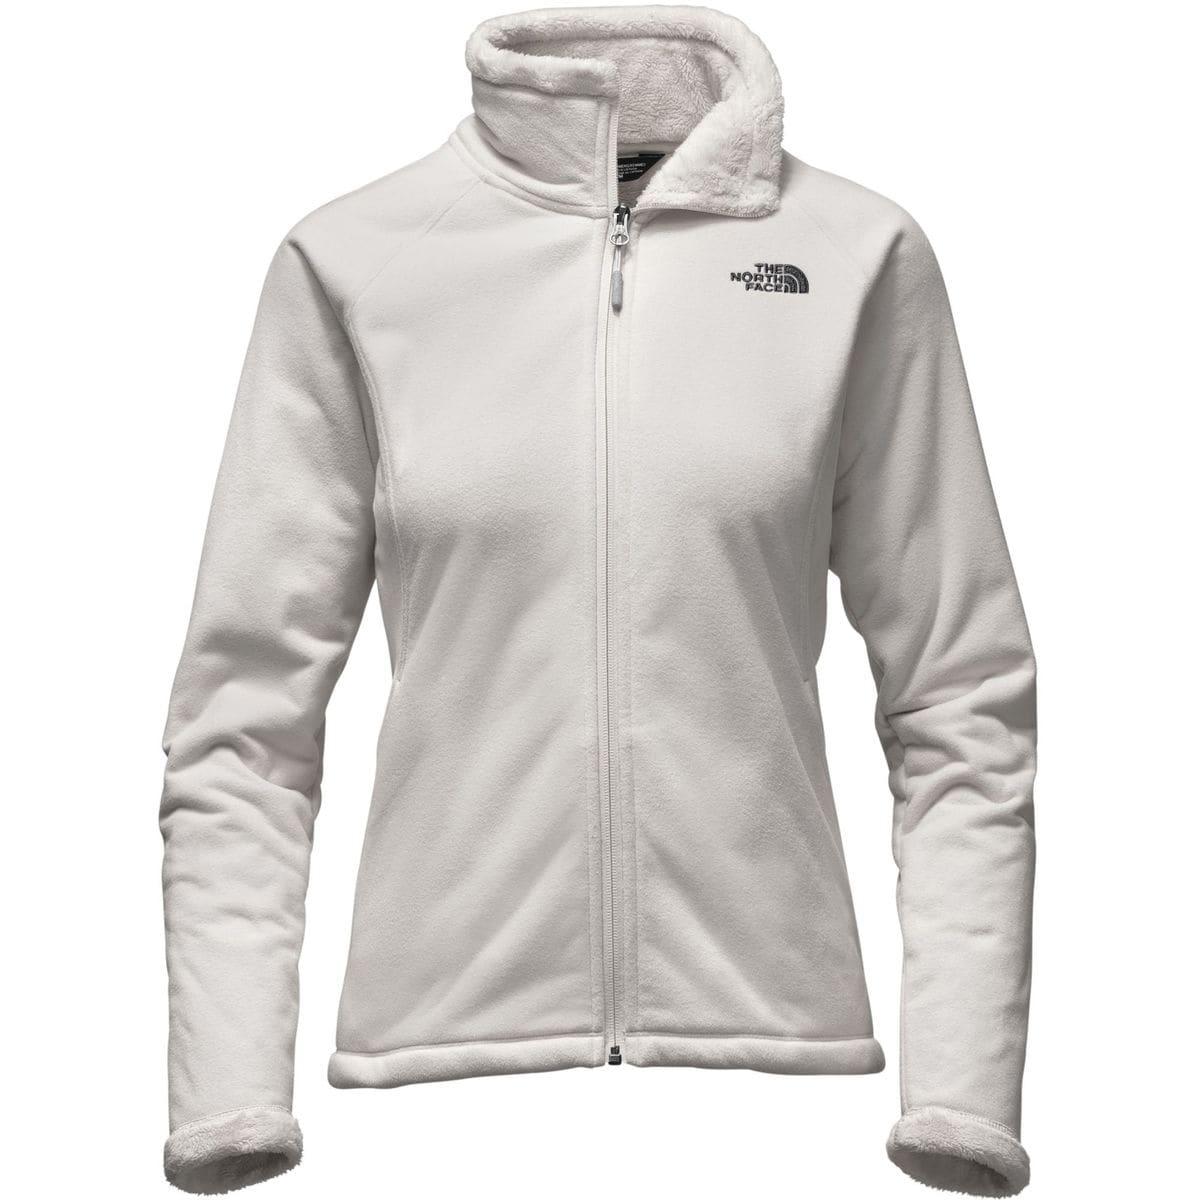 The North Face Morninglory 2 Full-Zip Fleece Jacket - Women